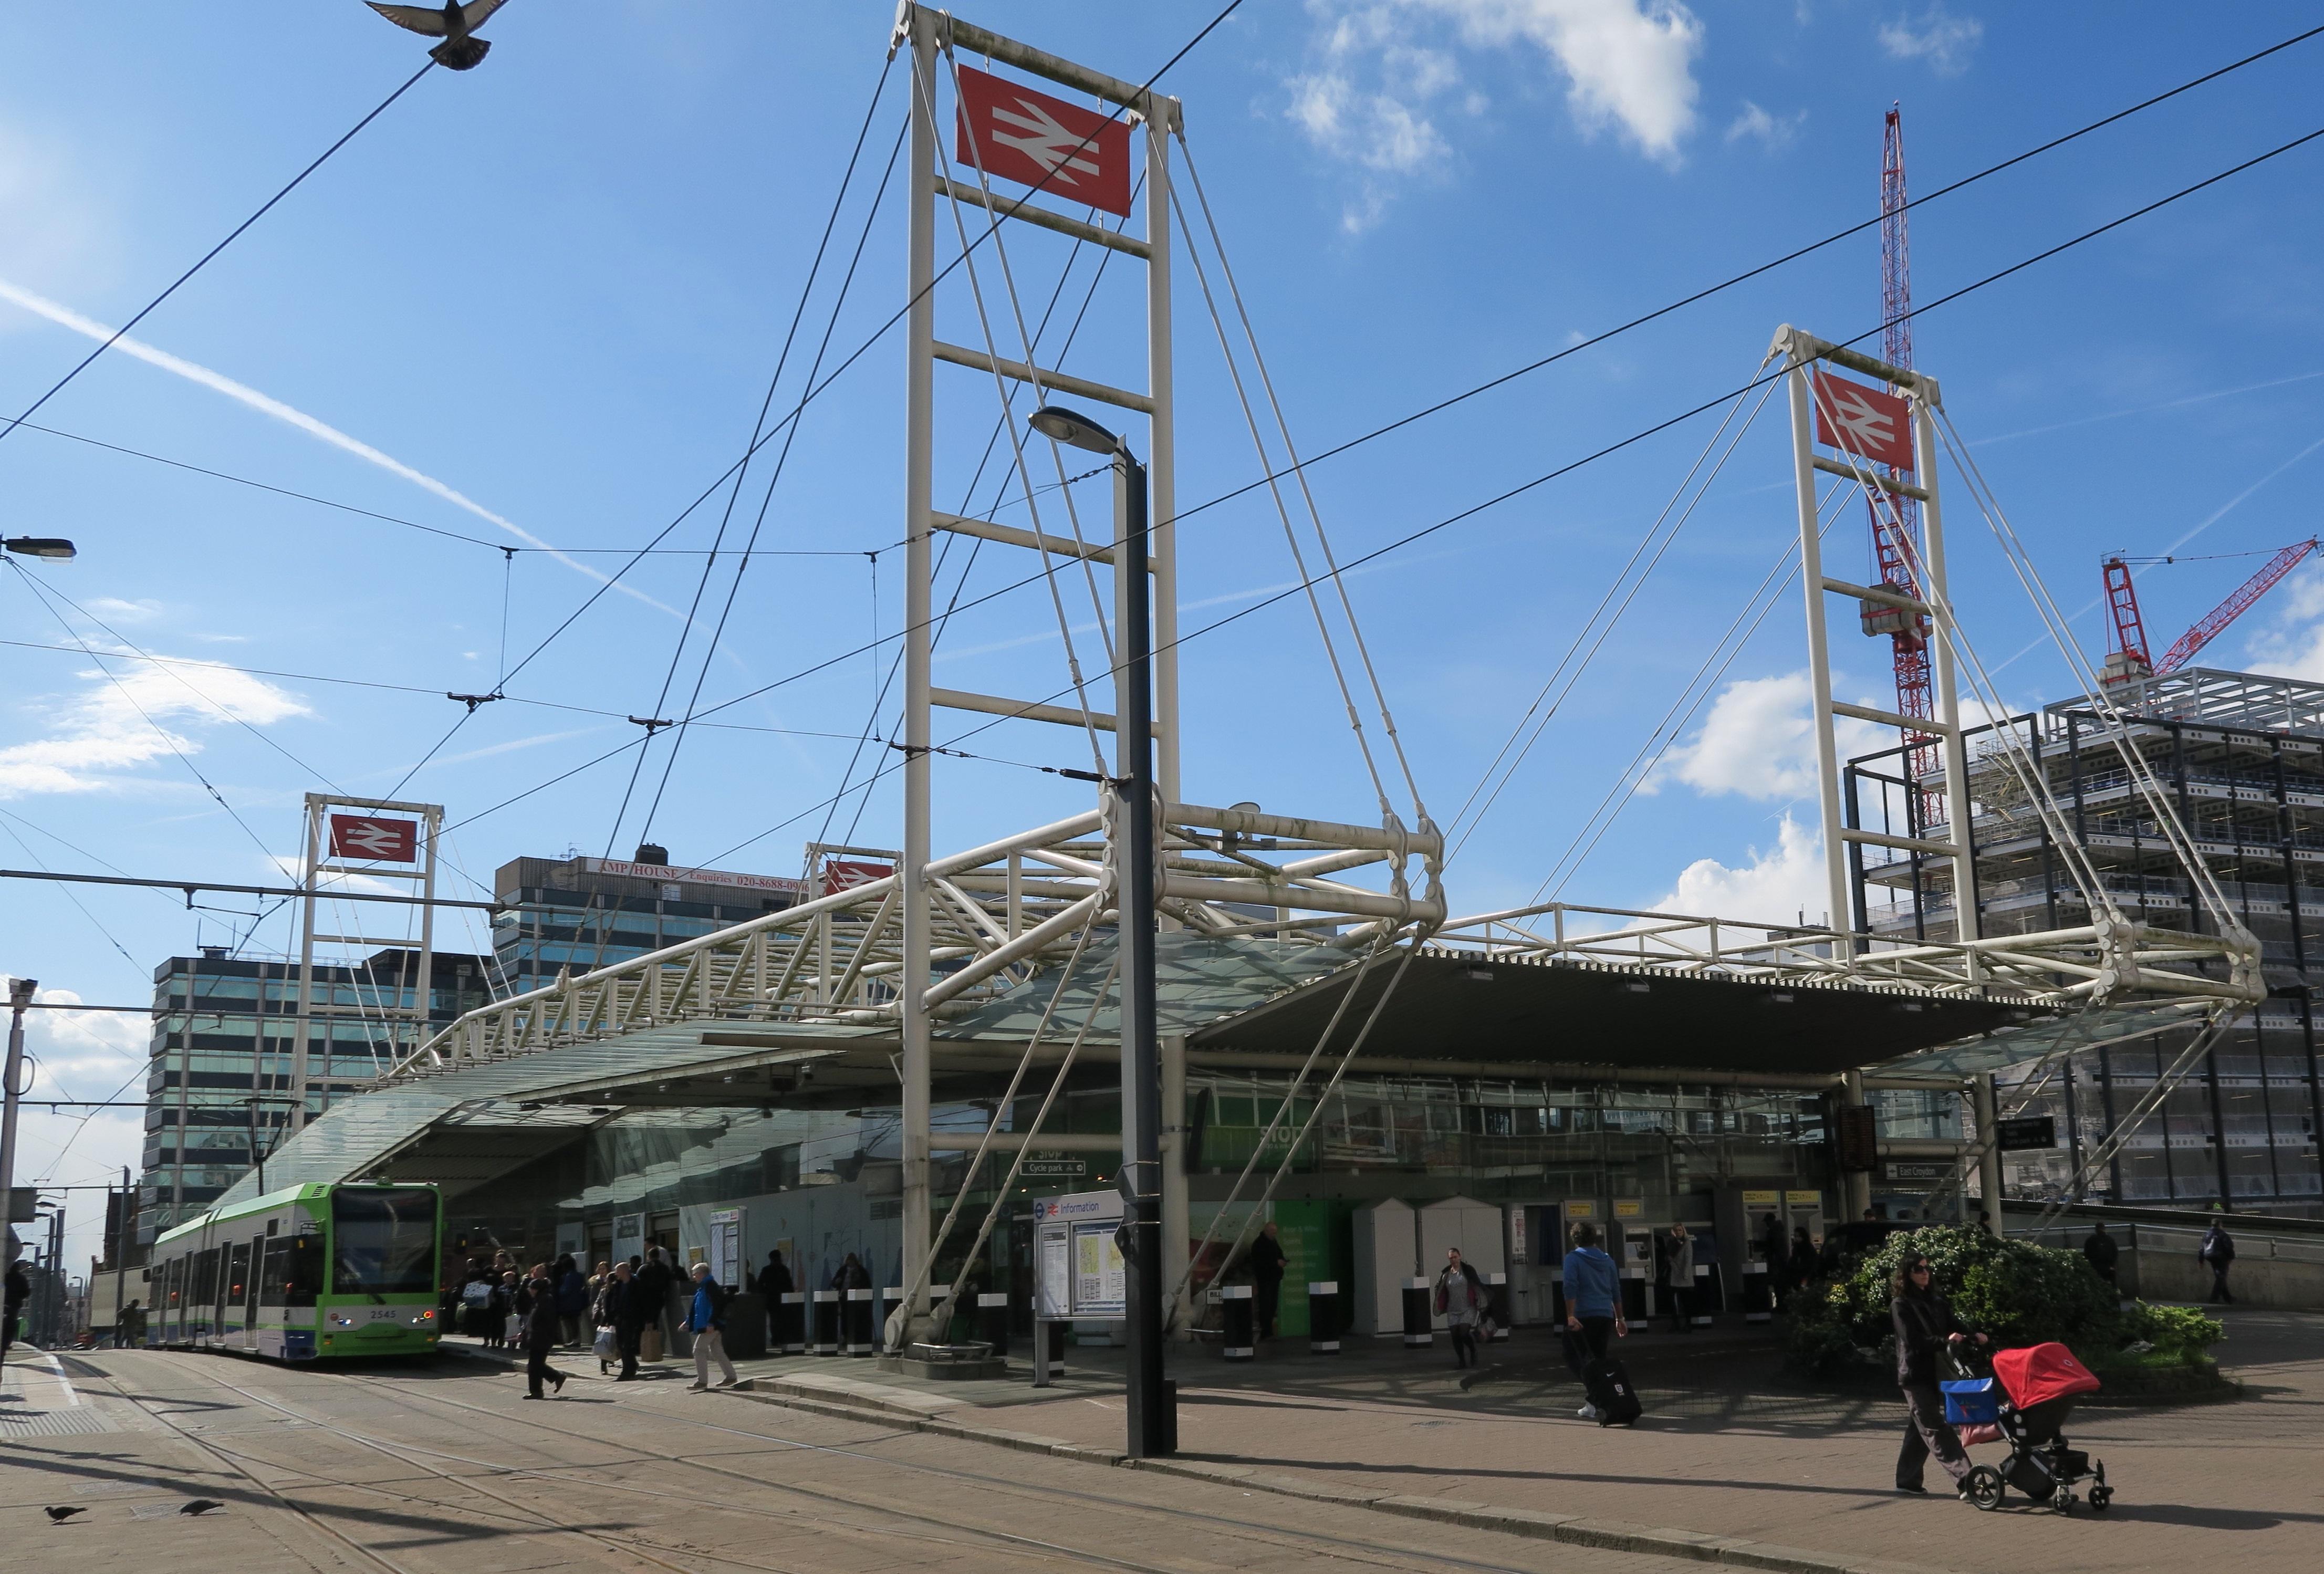 70d0c867fa0b7 East Croydon station - Wikipedia